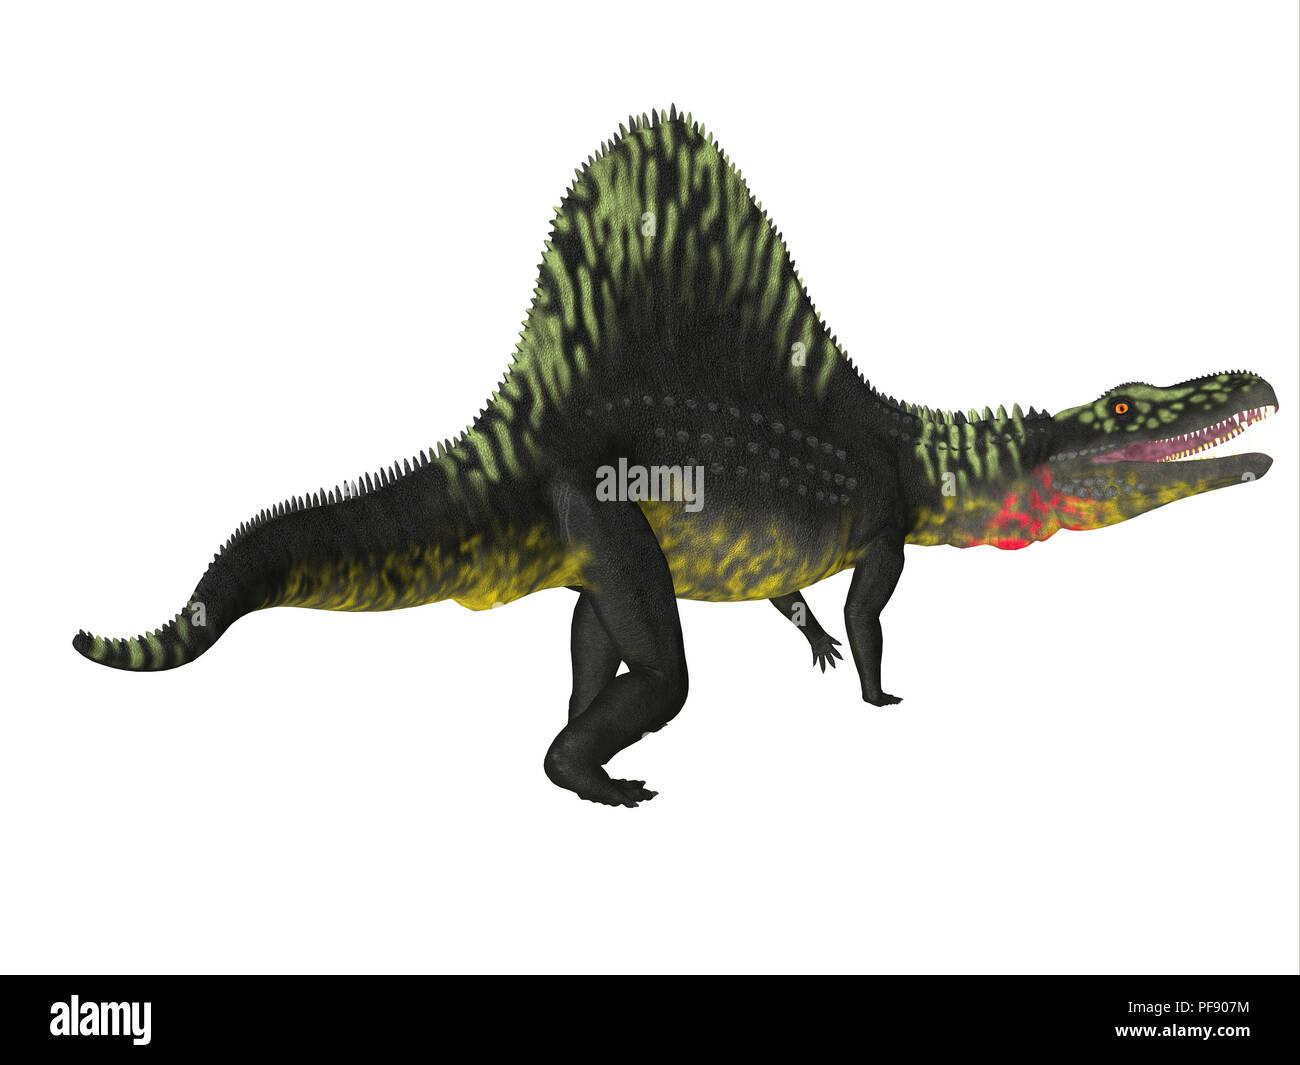 Arizonasaurus Dinosaur - Arizonasaurus was a carnivorous theropod dinosaur that lived in Arizona during the Triassic Period. - Stock Image